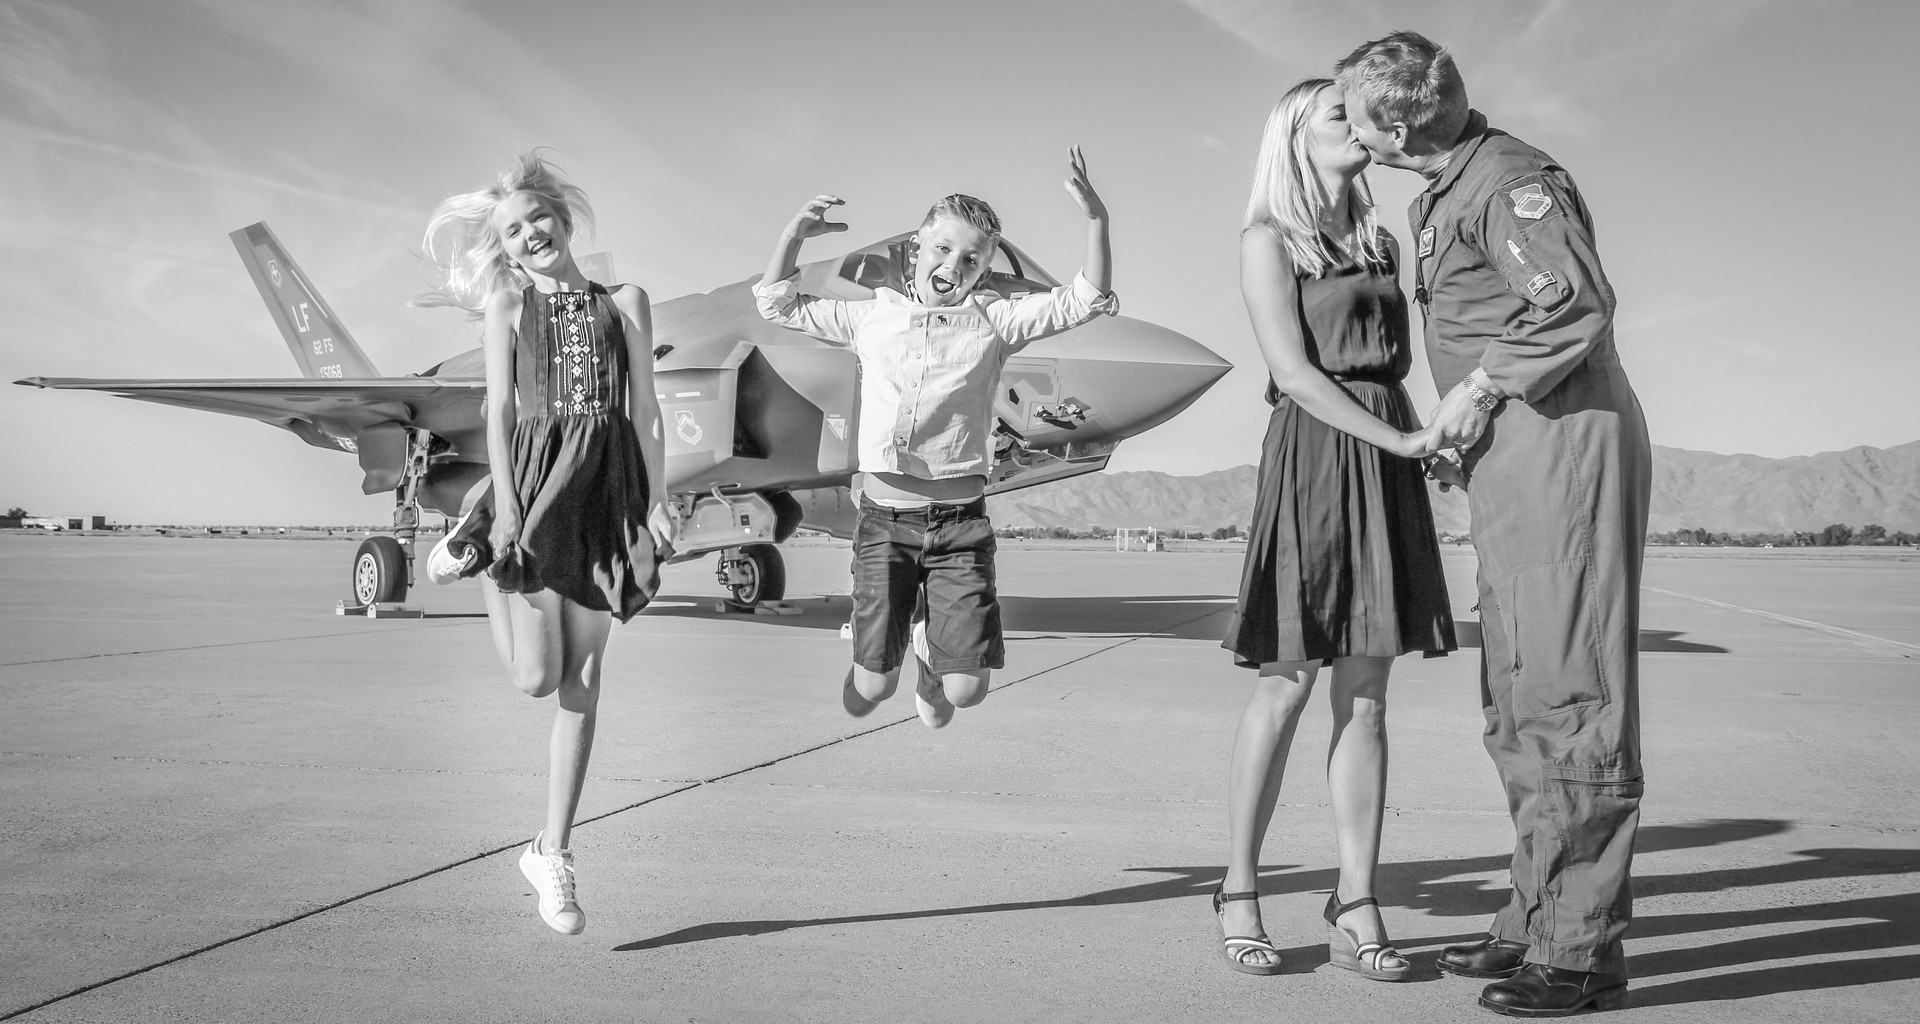 Military, Jets, F-35 Military Homecoming, Photography, Tucson Photography, www.KimberlyBillingtonPhotography.com, Military life, Military Famlies, Childrens Photography, Portrait Photography, Senior Pictures, Arizona, Tucson, Davis Monthan AFB, Luke AFB, AIR FORCE, marines, navy, aviation, Military, Jets, F-35, F-16, Thunderbirds, vintage photoshoot, Military Homecoming, Photography, Tucson Photography, www.KimberlyBillingtonPhotography.com, Military life, Military Famlies, Childrens Photography, Portrait Photography, Senior Pictures, Arizona, Tucson  Portrait photography, military photography, military homecoming, senior pictures, engagement session, engagement photography, couples session, wedding photographer, jet photos, pilot photos, family photography, lifestyle photography, maternity photographer, Tucson Arizona photographer, engagement photographer, military homecoming photography, Military homecoming videography, wedding photographer, arizona photographer,   Kimberly Billington is a photographer in Tucson, Arizona specializing in family, couples and engagement photography, military homecomings, military family photo sessions, squadron aviation family photography, family photography, toddler and children sessions, Birthday photography, event photography, and Military Homecoming videography.  Portrait photography, military photography, military homecoming, senior pictures, engagement session, engagement photography, couples session, wedding photographer, jet photos, pilot photos, family photography, lifestyle photography, maternity photographer, Tucson Arizona photographer, engagement photographer, military homecoming photography, Military homecoming videography, wedding photographer, arizona photographer, Davis Monthan AFB, Luke AFB, AIR FORCE, marines, navy, aviation, Military, Jets, F-35, F-16, Thunderbirds, vintage photoshoot, Military Homecoming, Photography, Tucson Photography, www.KimberlyBillingtonPhotography.com, Military life, Military Famlies, Chil